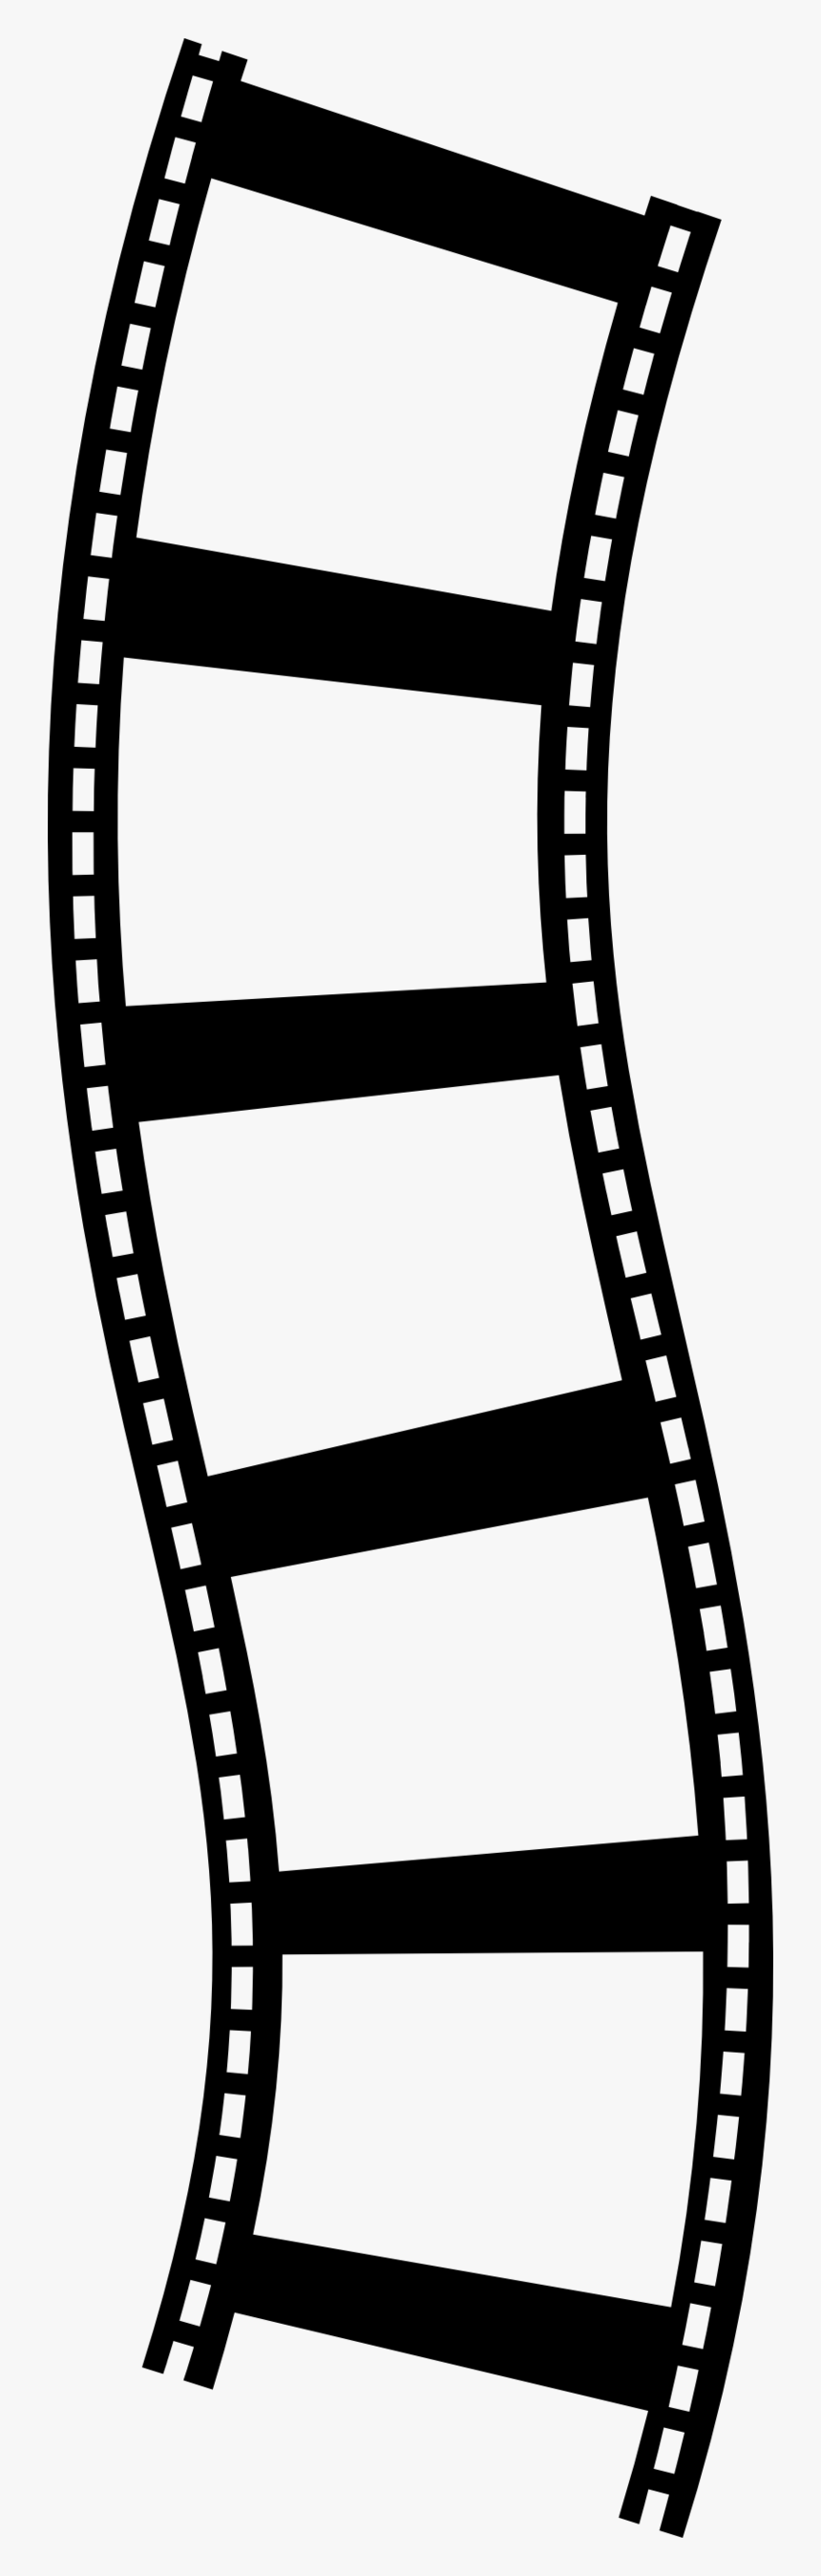 Clipart - Film Strip Clip Art, HD Png Download, Free Download